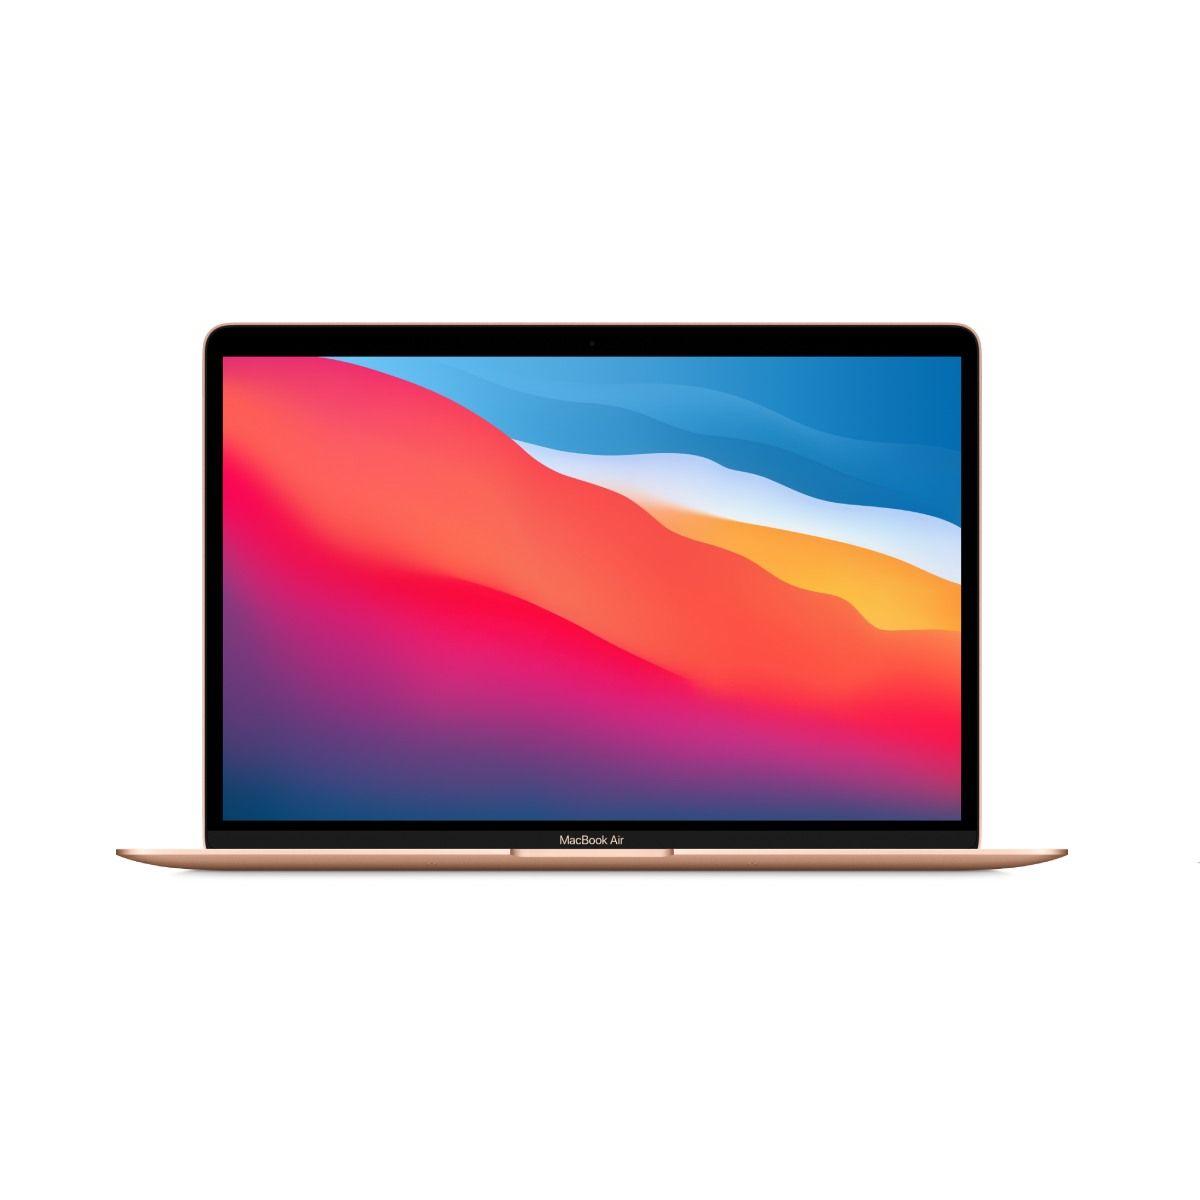 buy Macbook Air (M1 Chip) online in india best prices